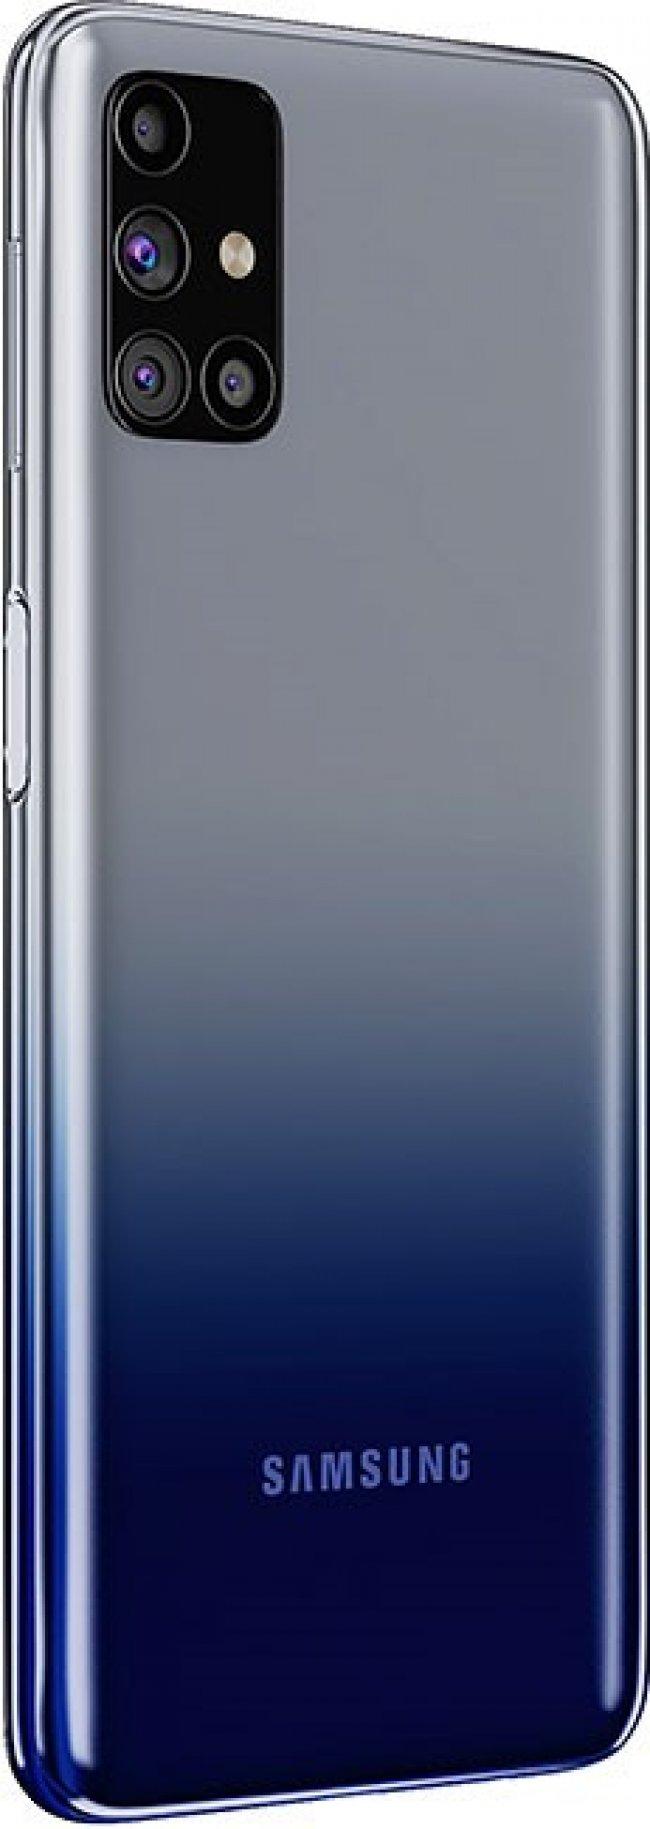 Снимки на Samsung Galaxy M31s M317 DUAL